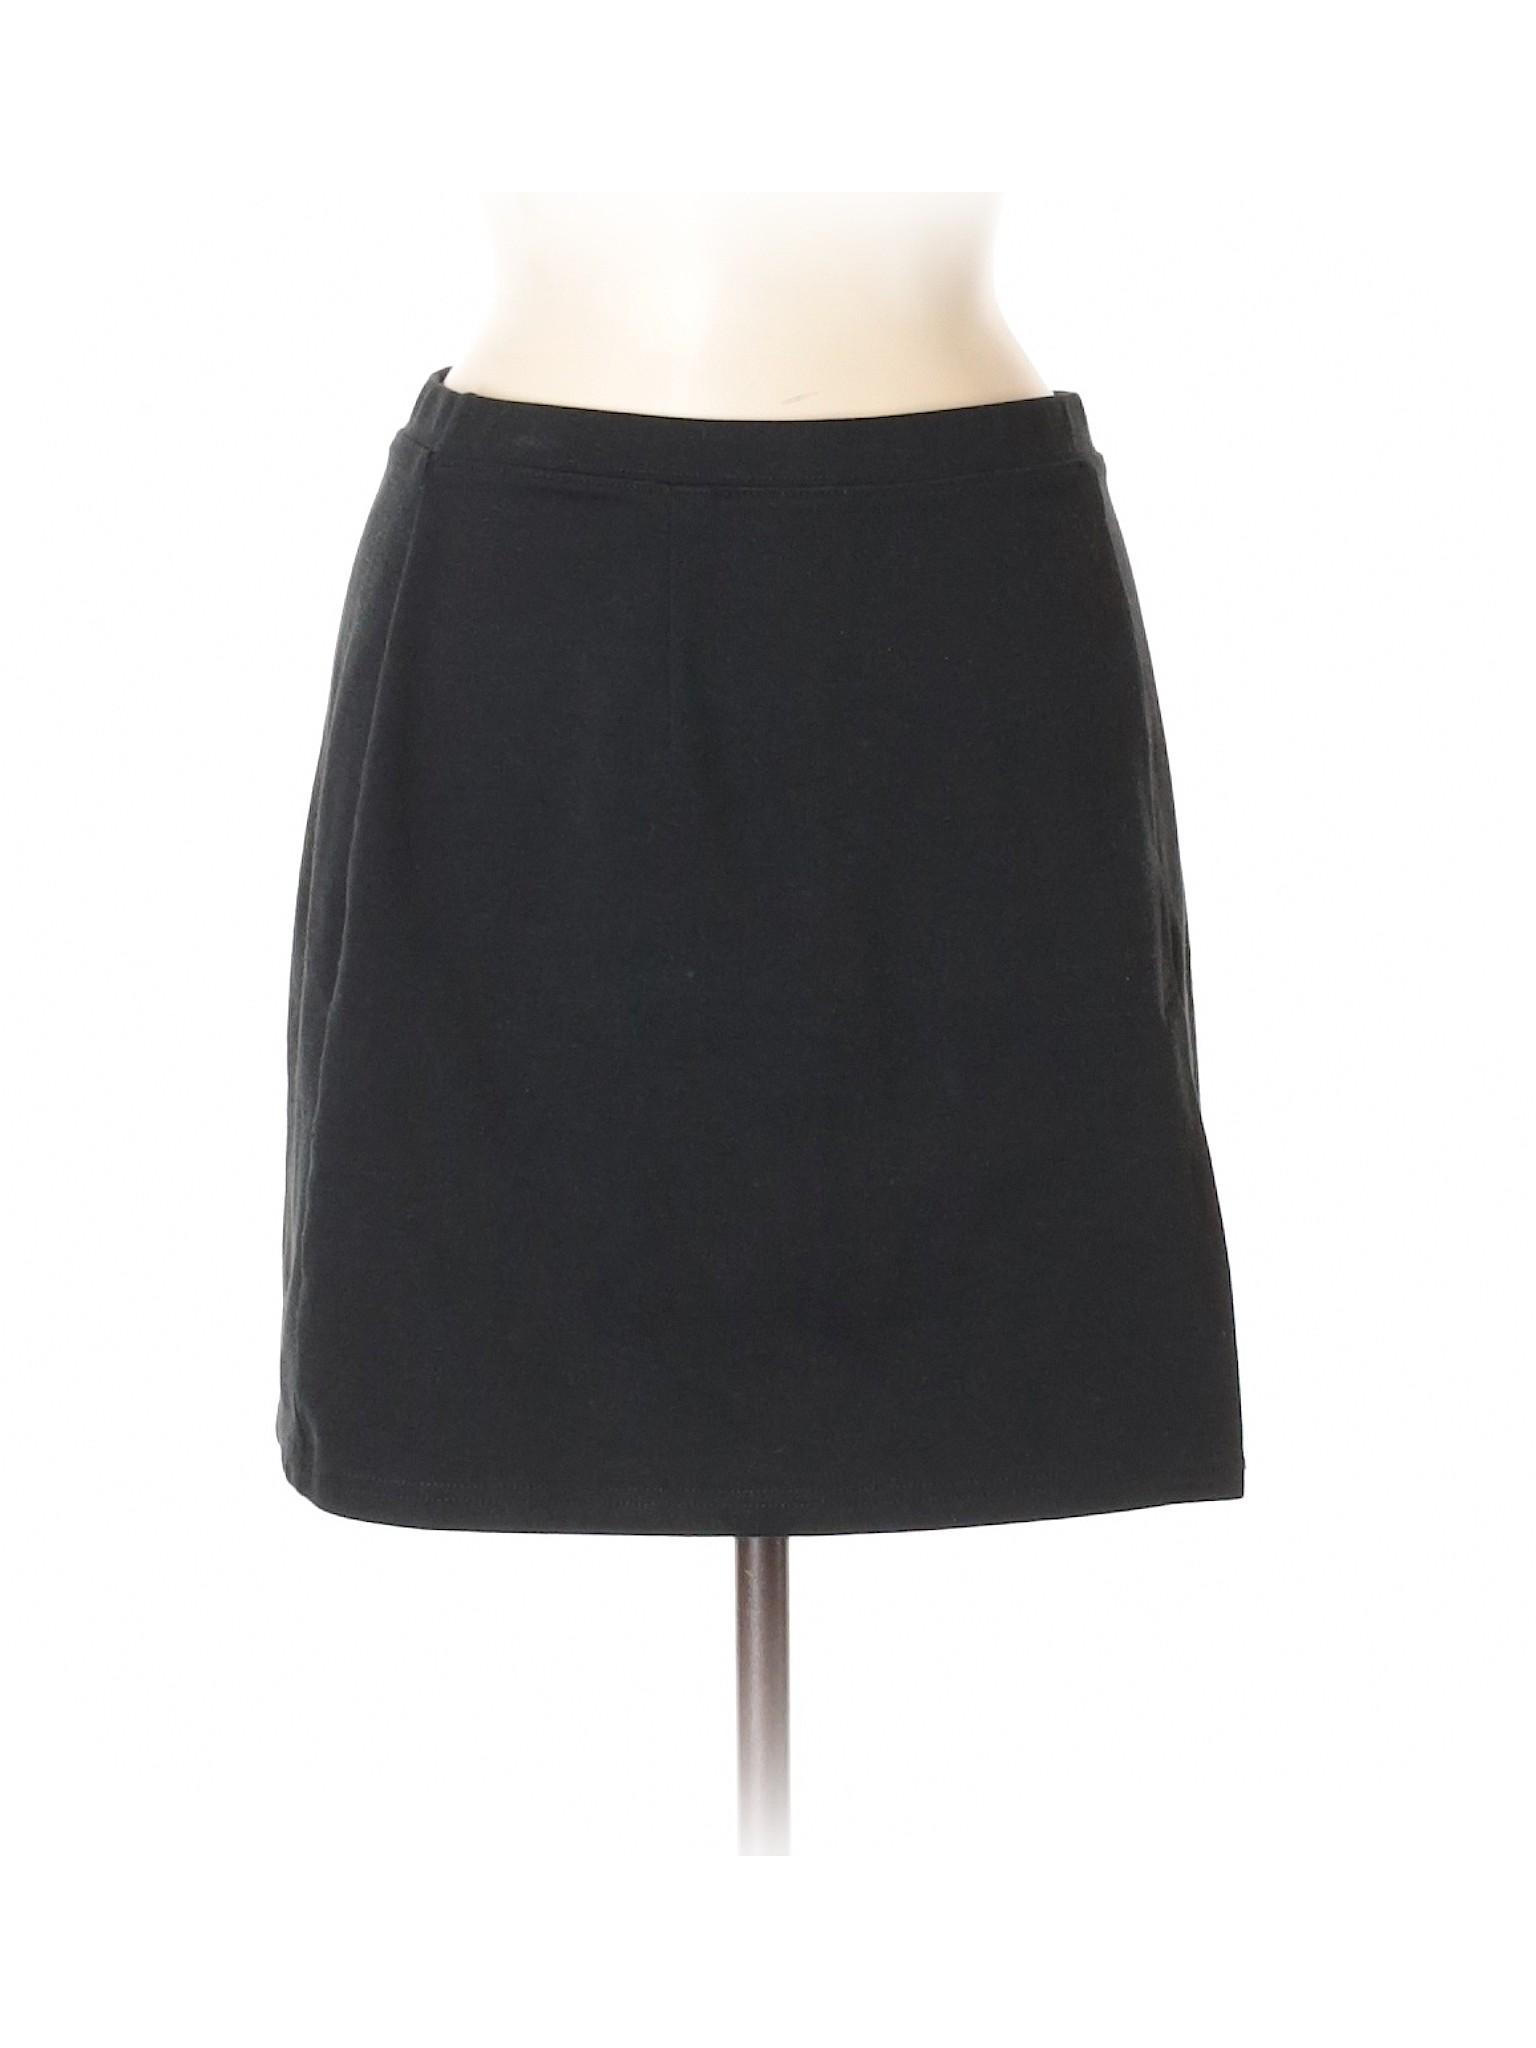 Casual Skirt Skirt Skirt Boutique Casual Boutique Casual Casual Boutique Boutique O7Aqxx6